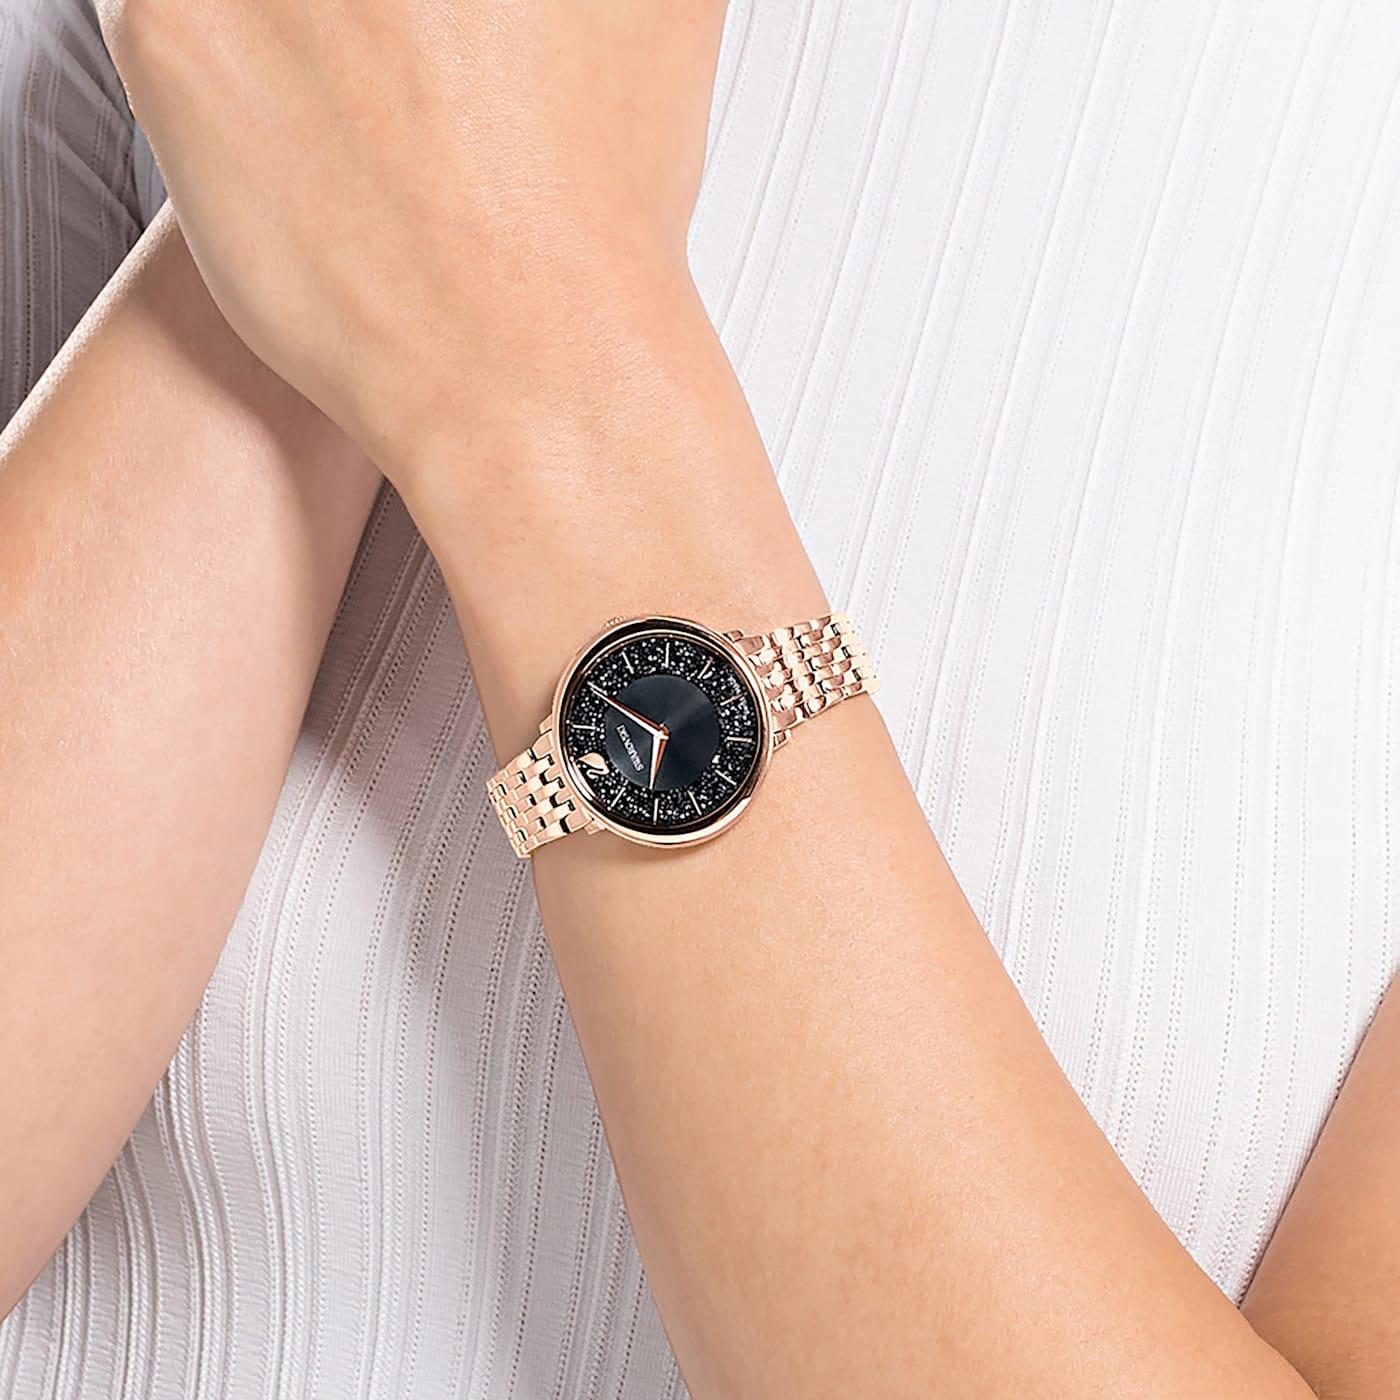 Montre Crystalline Chic Bracelet en métal, Noir, PVD doré rose,Swarovski